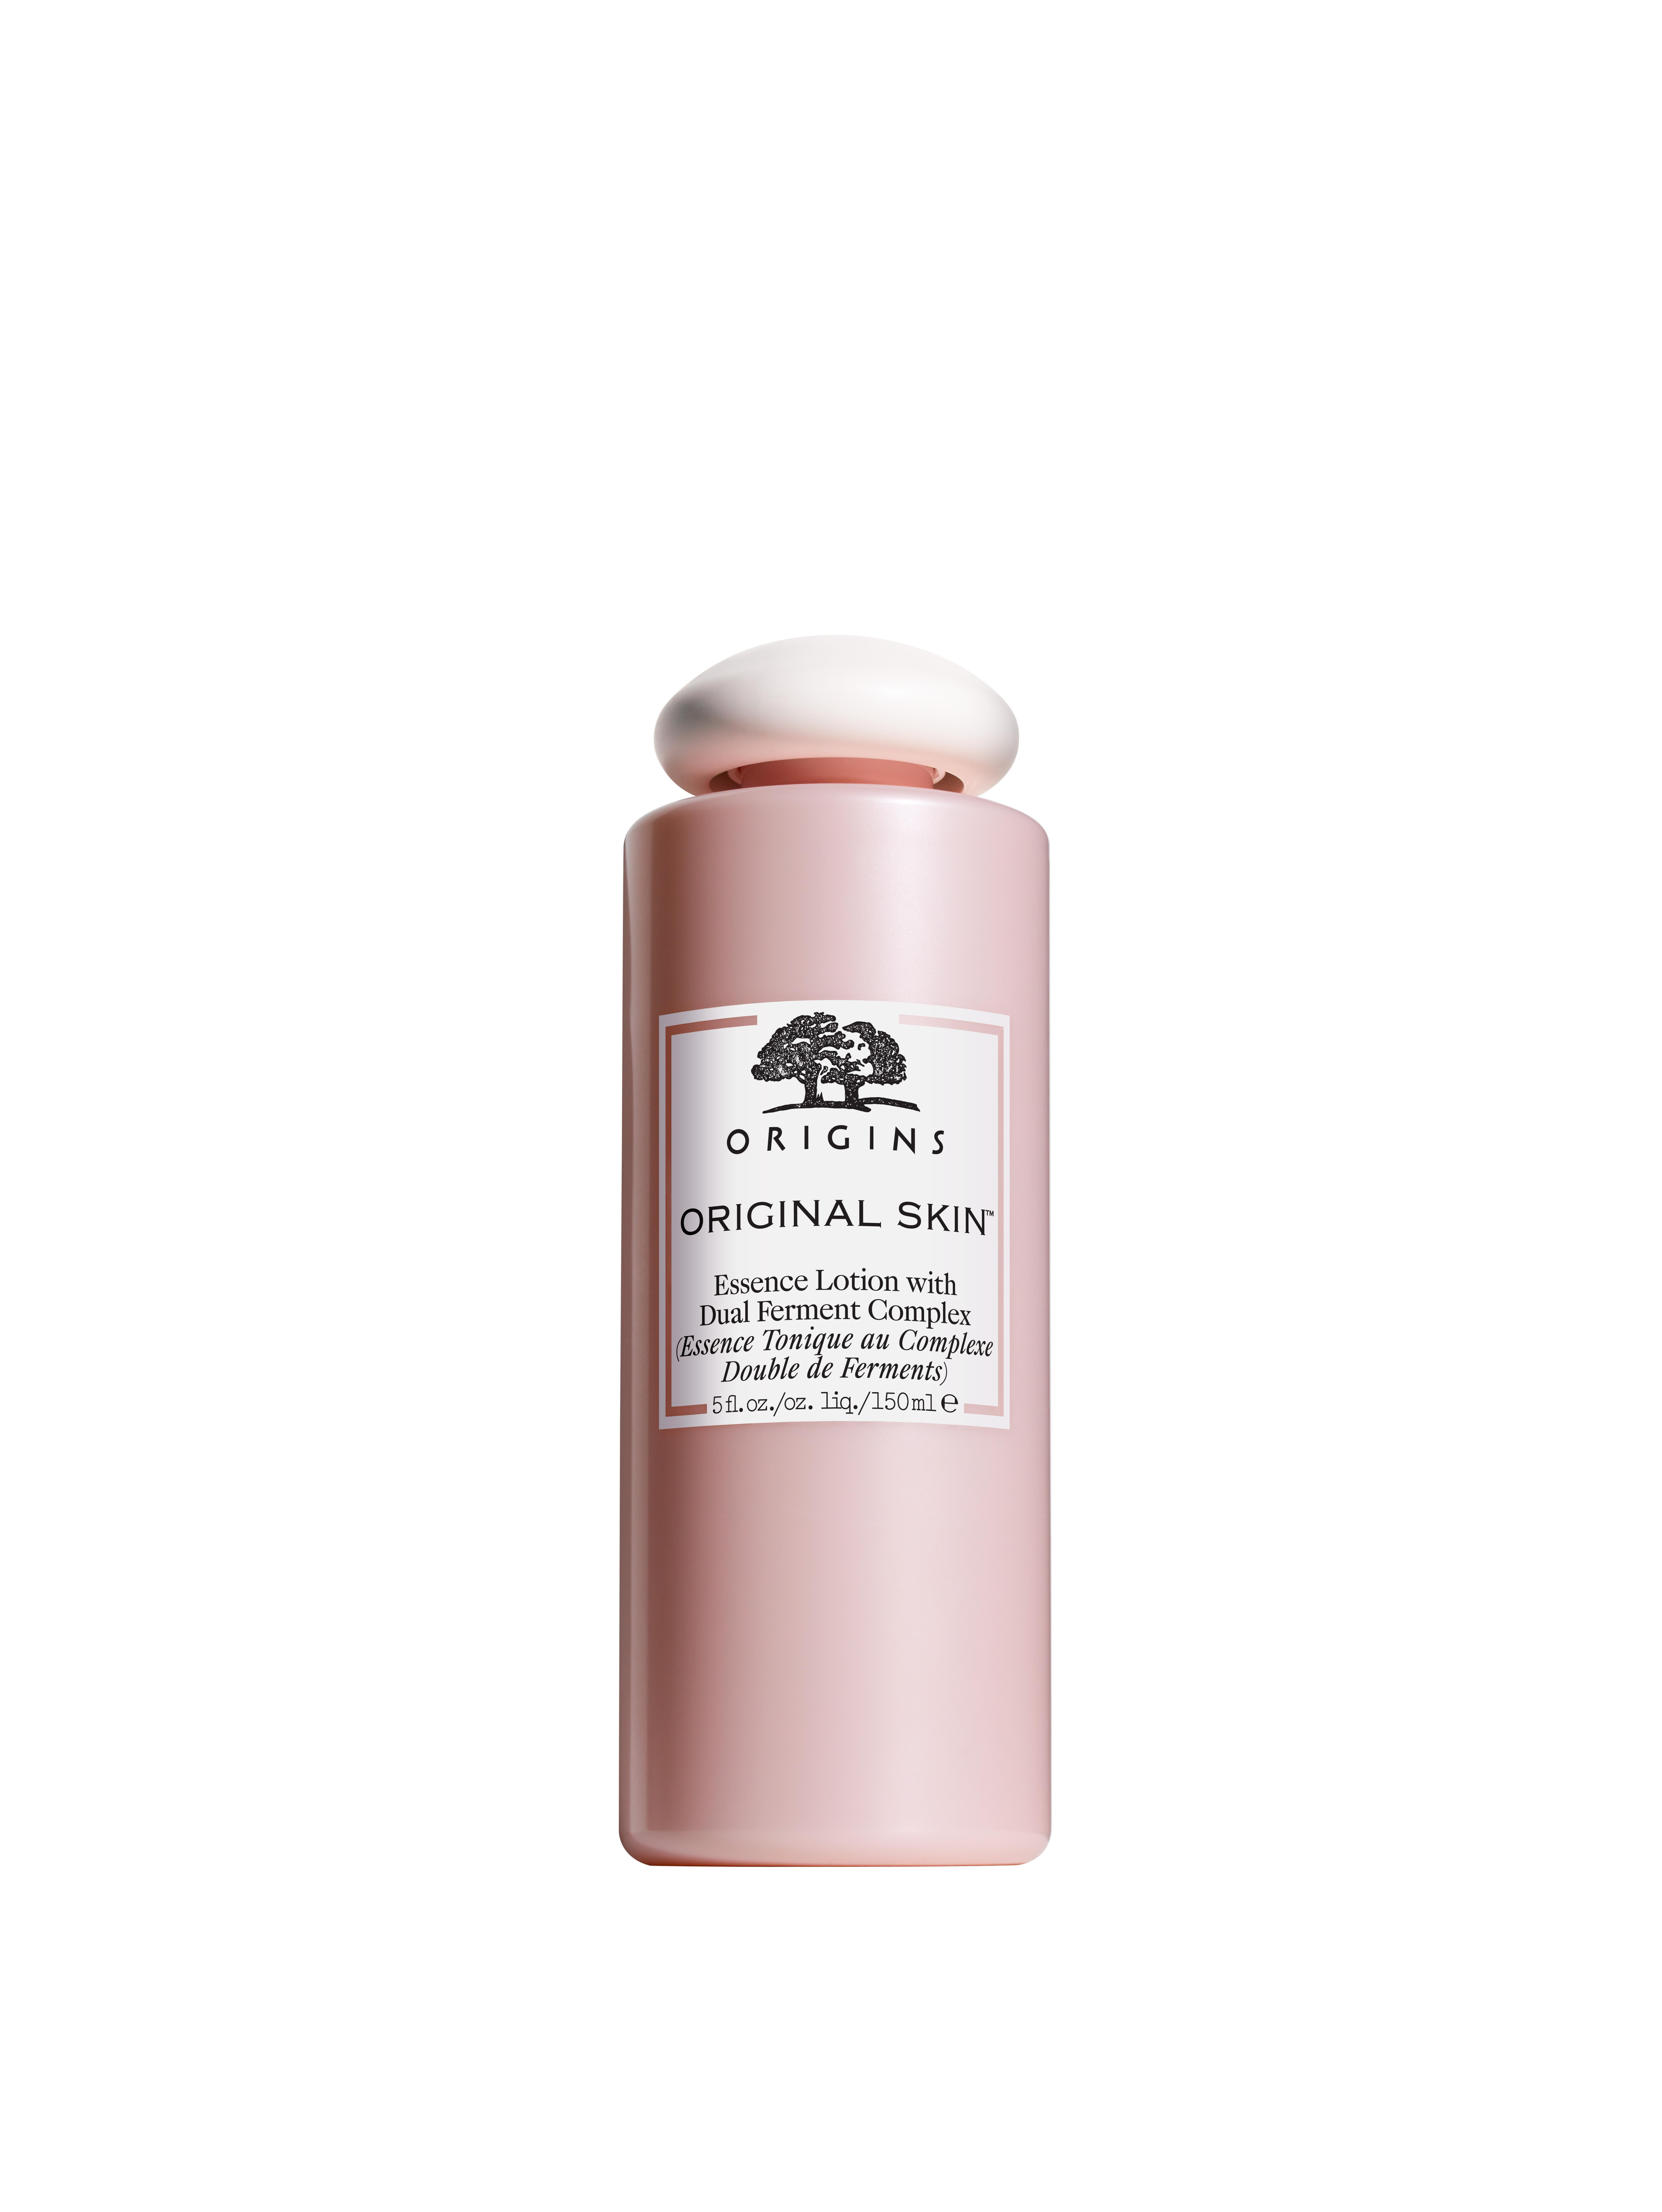 Original Skin Essence Lotion